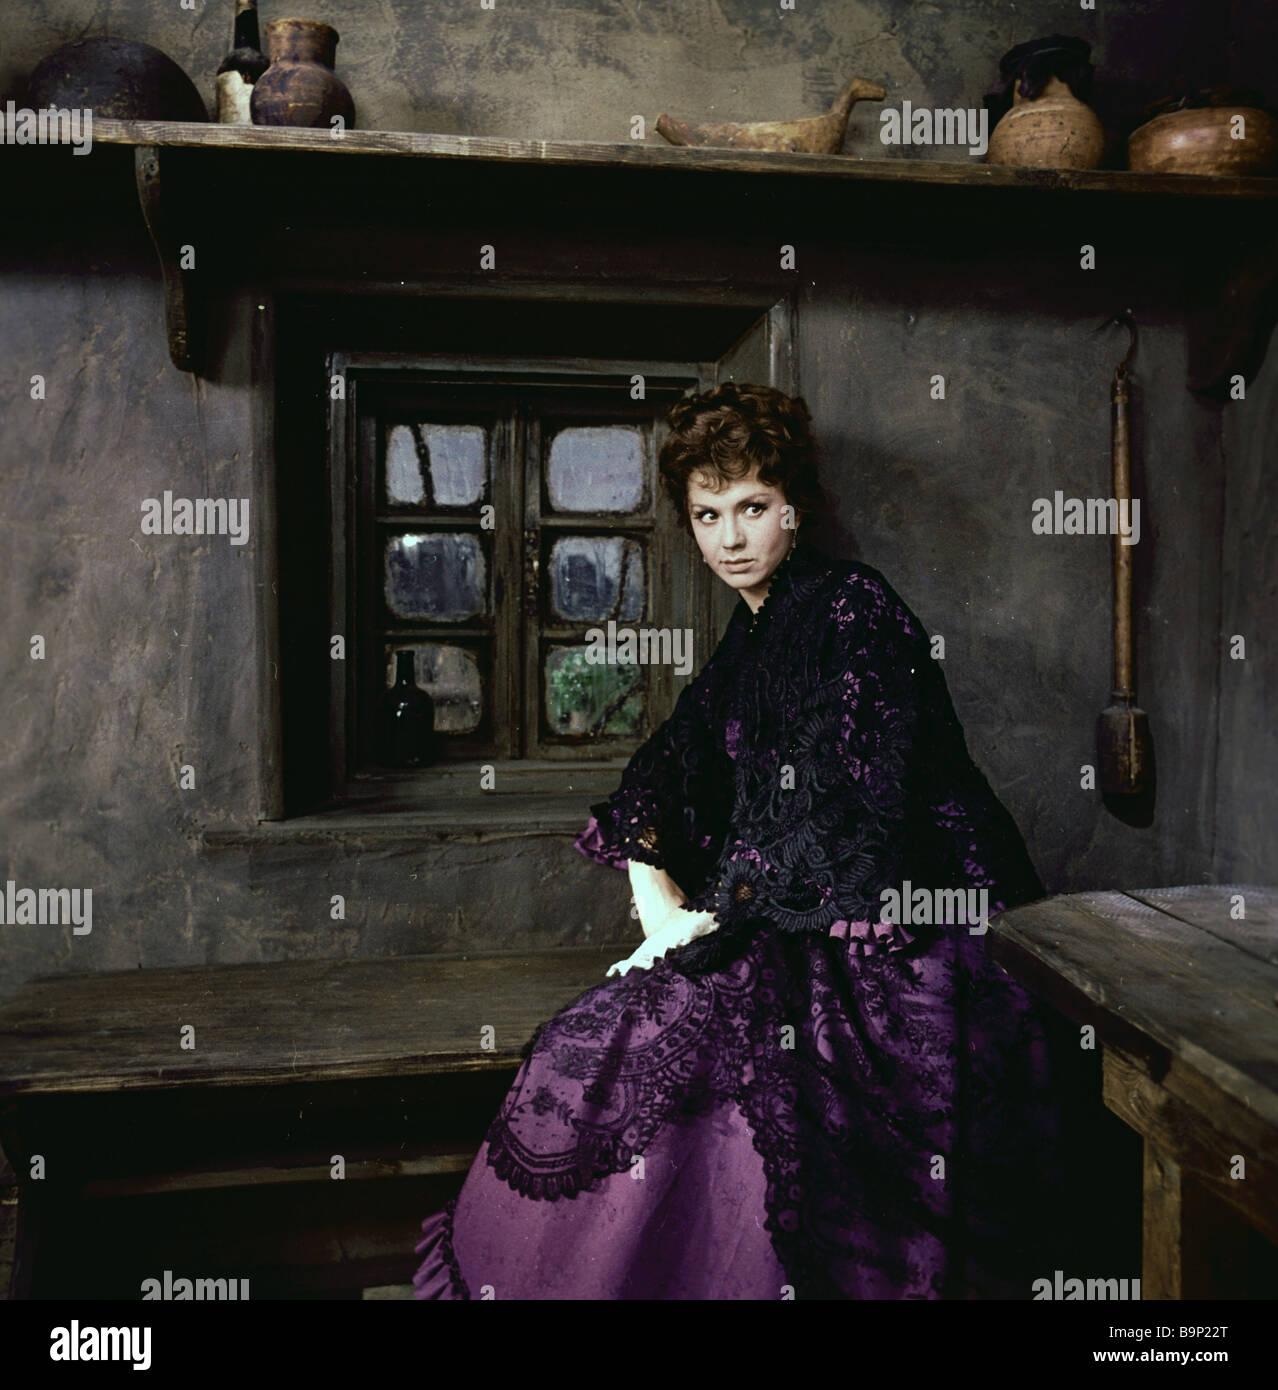 Lionella Pyryeva as Grushenka in Ivan Pyryev s movie The Brothers Karamazov - Stock Image